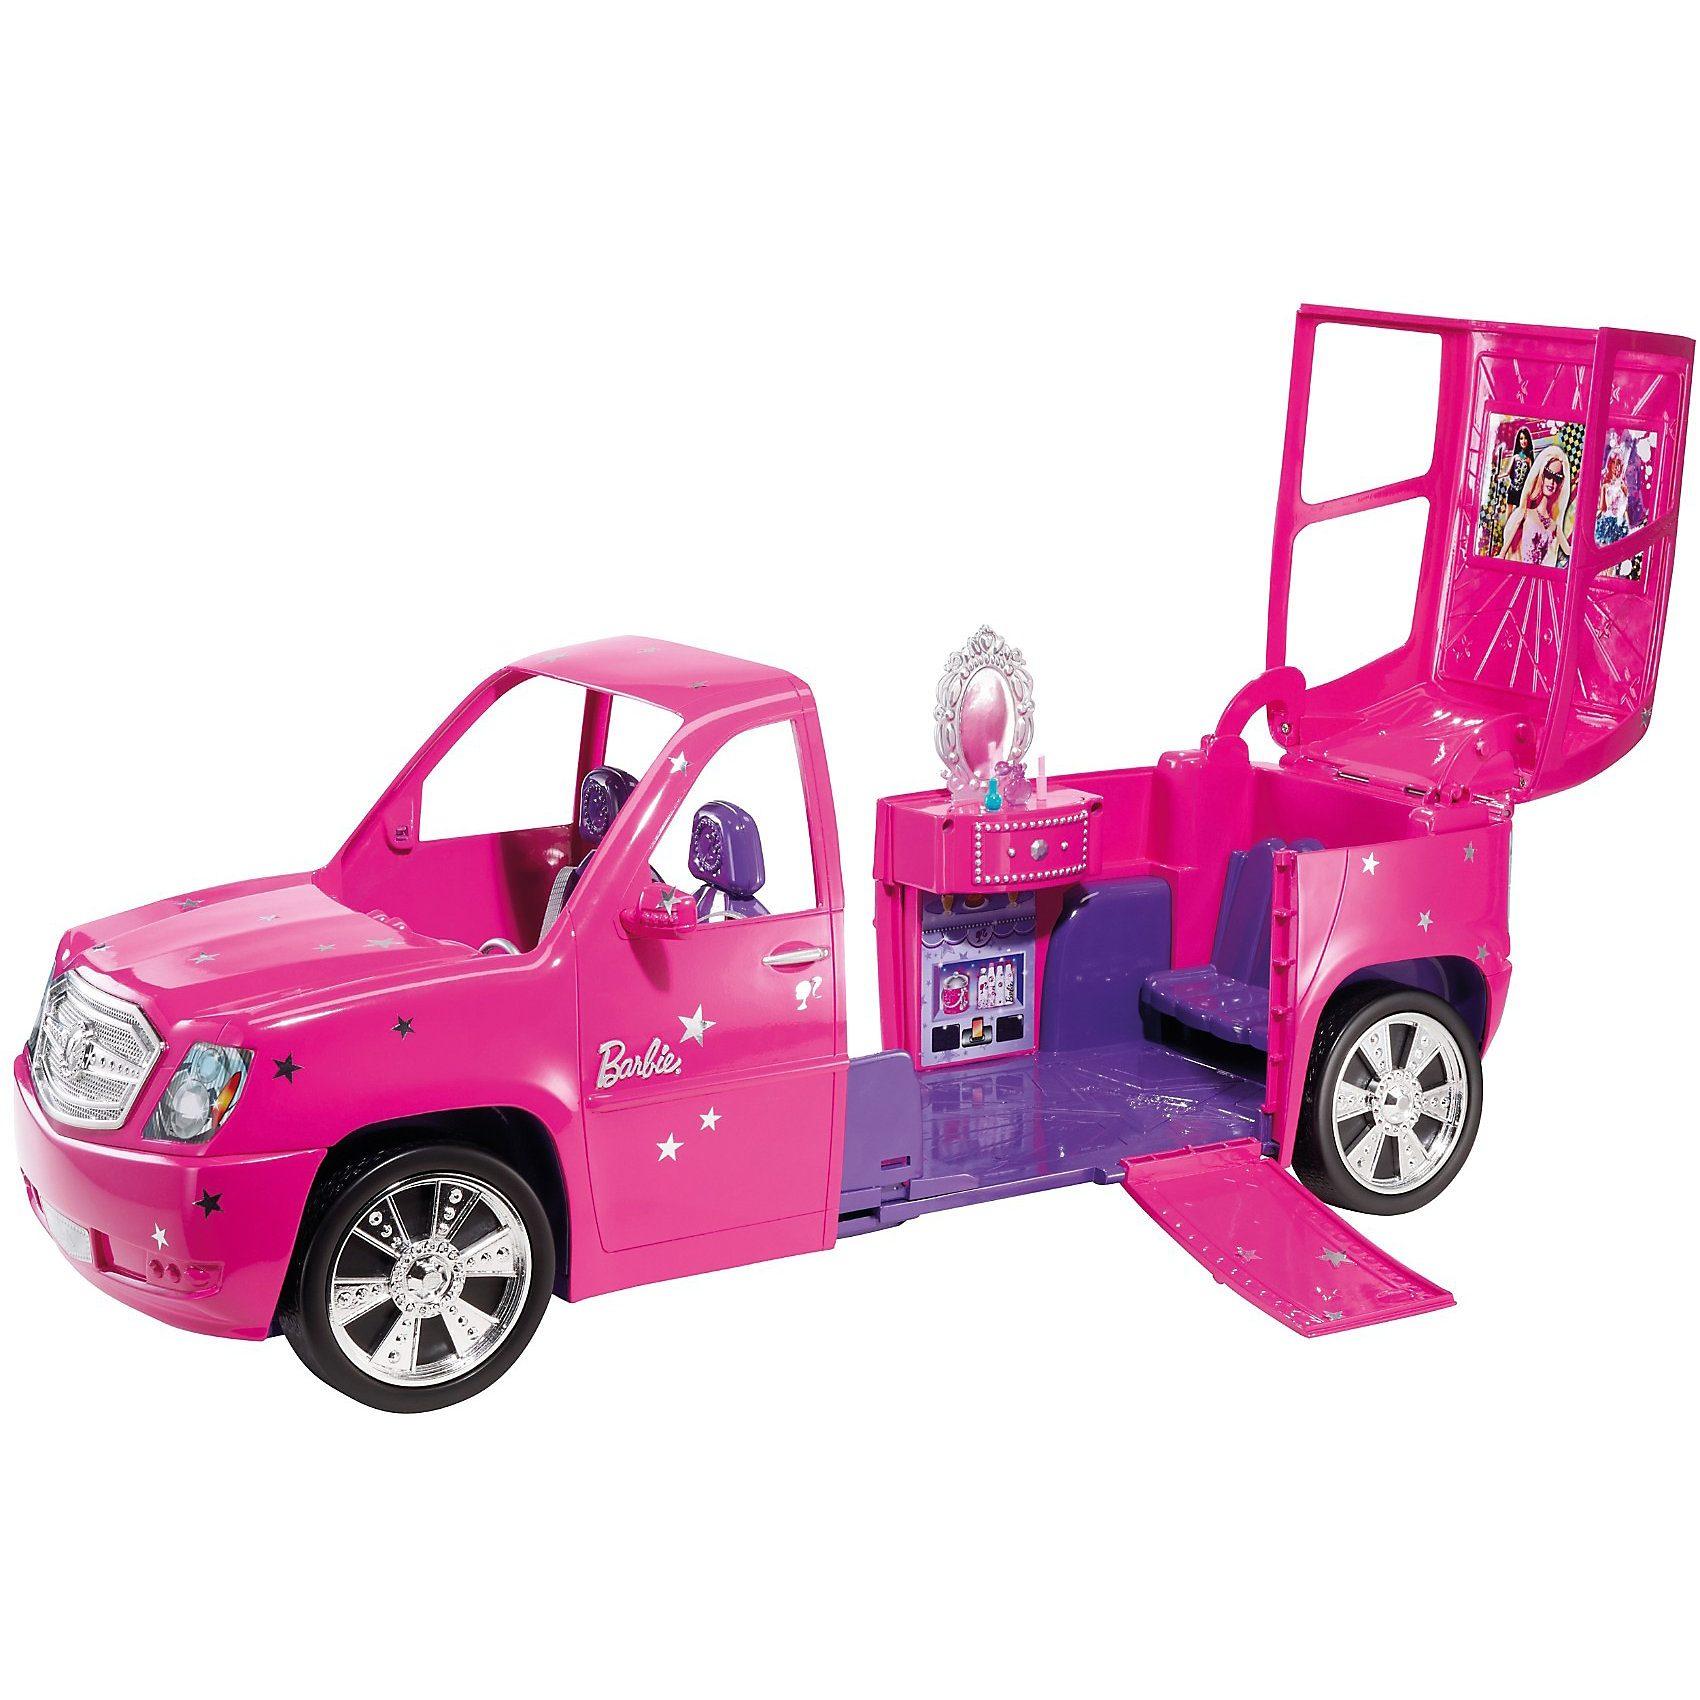 Mattel Barbie Fashionista Limo